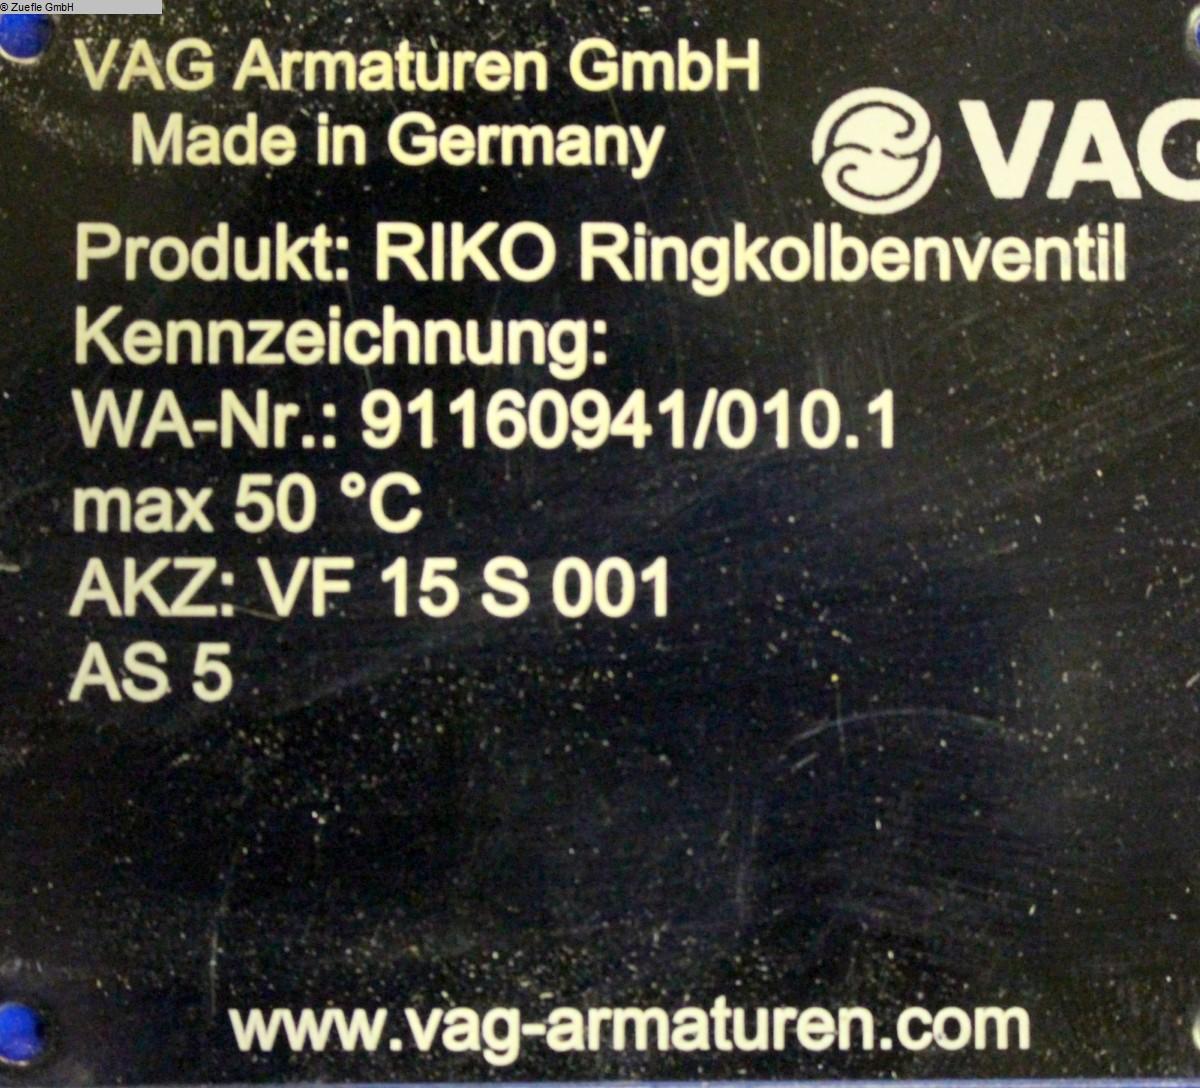 gebrauchte Hydraulikaggregat VAG RIKO DN600 PN10